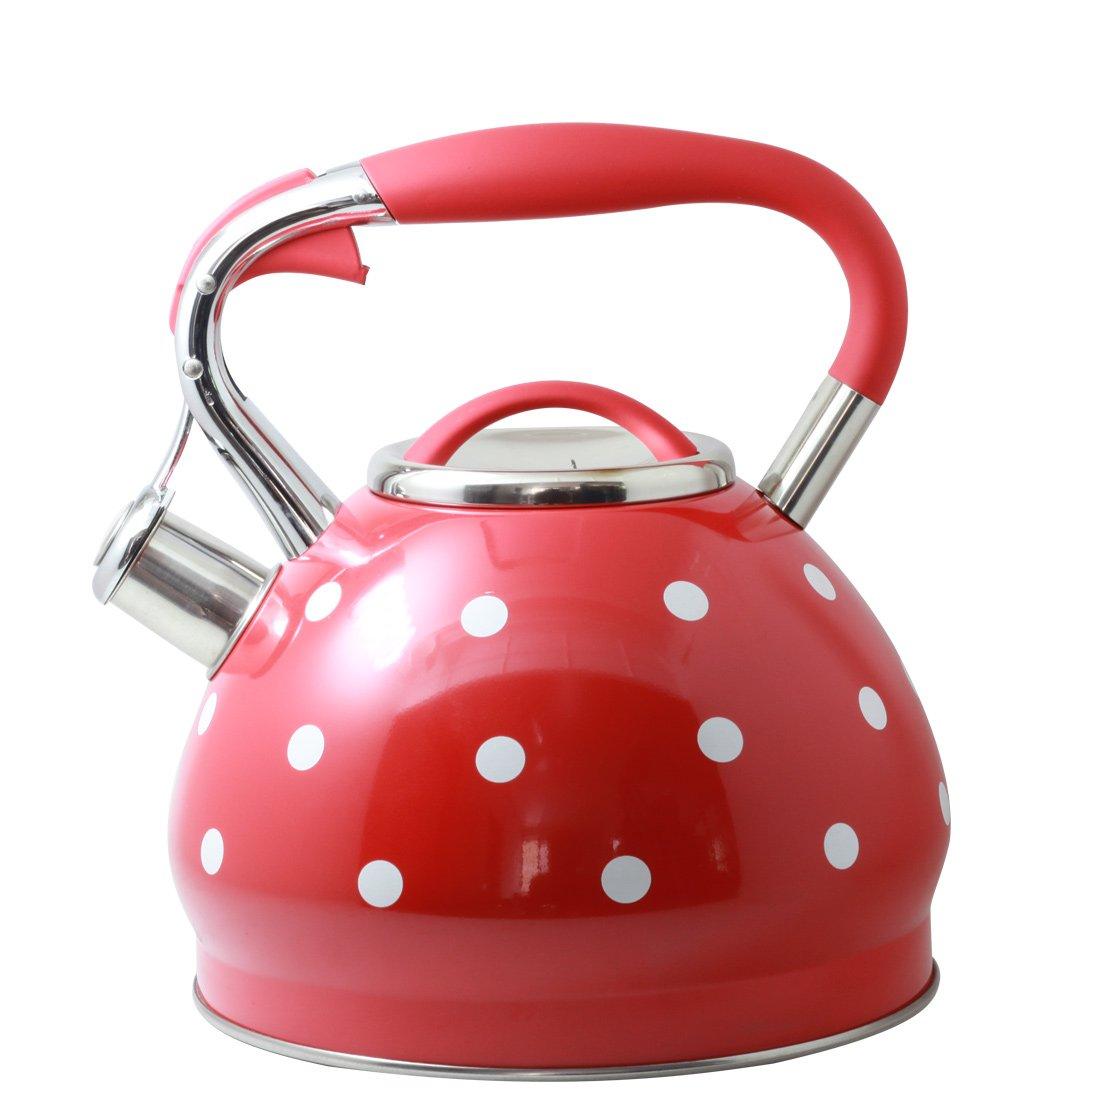 Riwendell 3.2 Quart Whistling Tea Kettle Stainless Steel Dot Print StoveTop Teapot (GS-04517CFY-3.0L-Red)